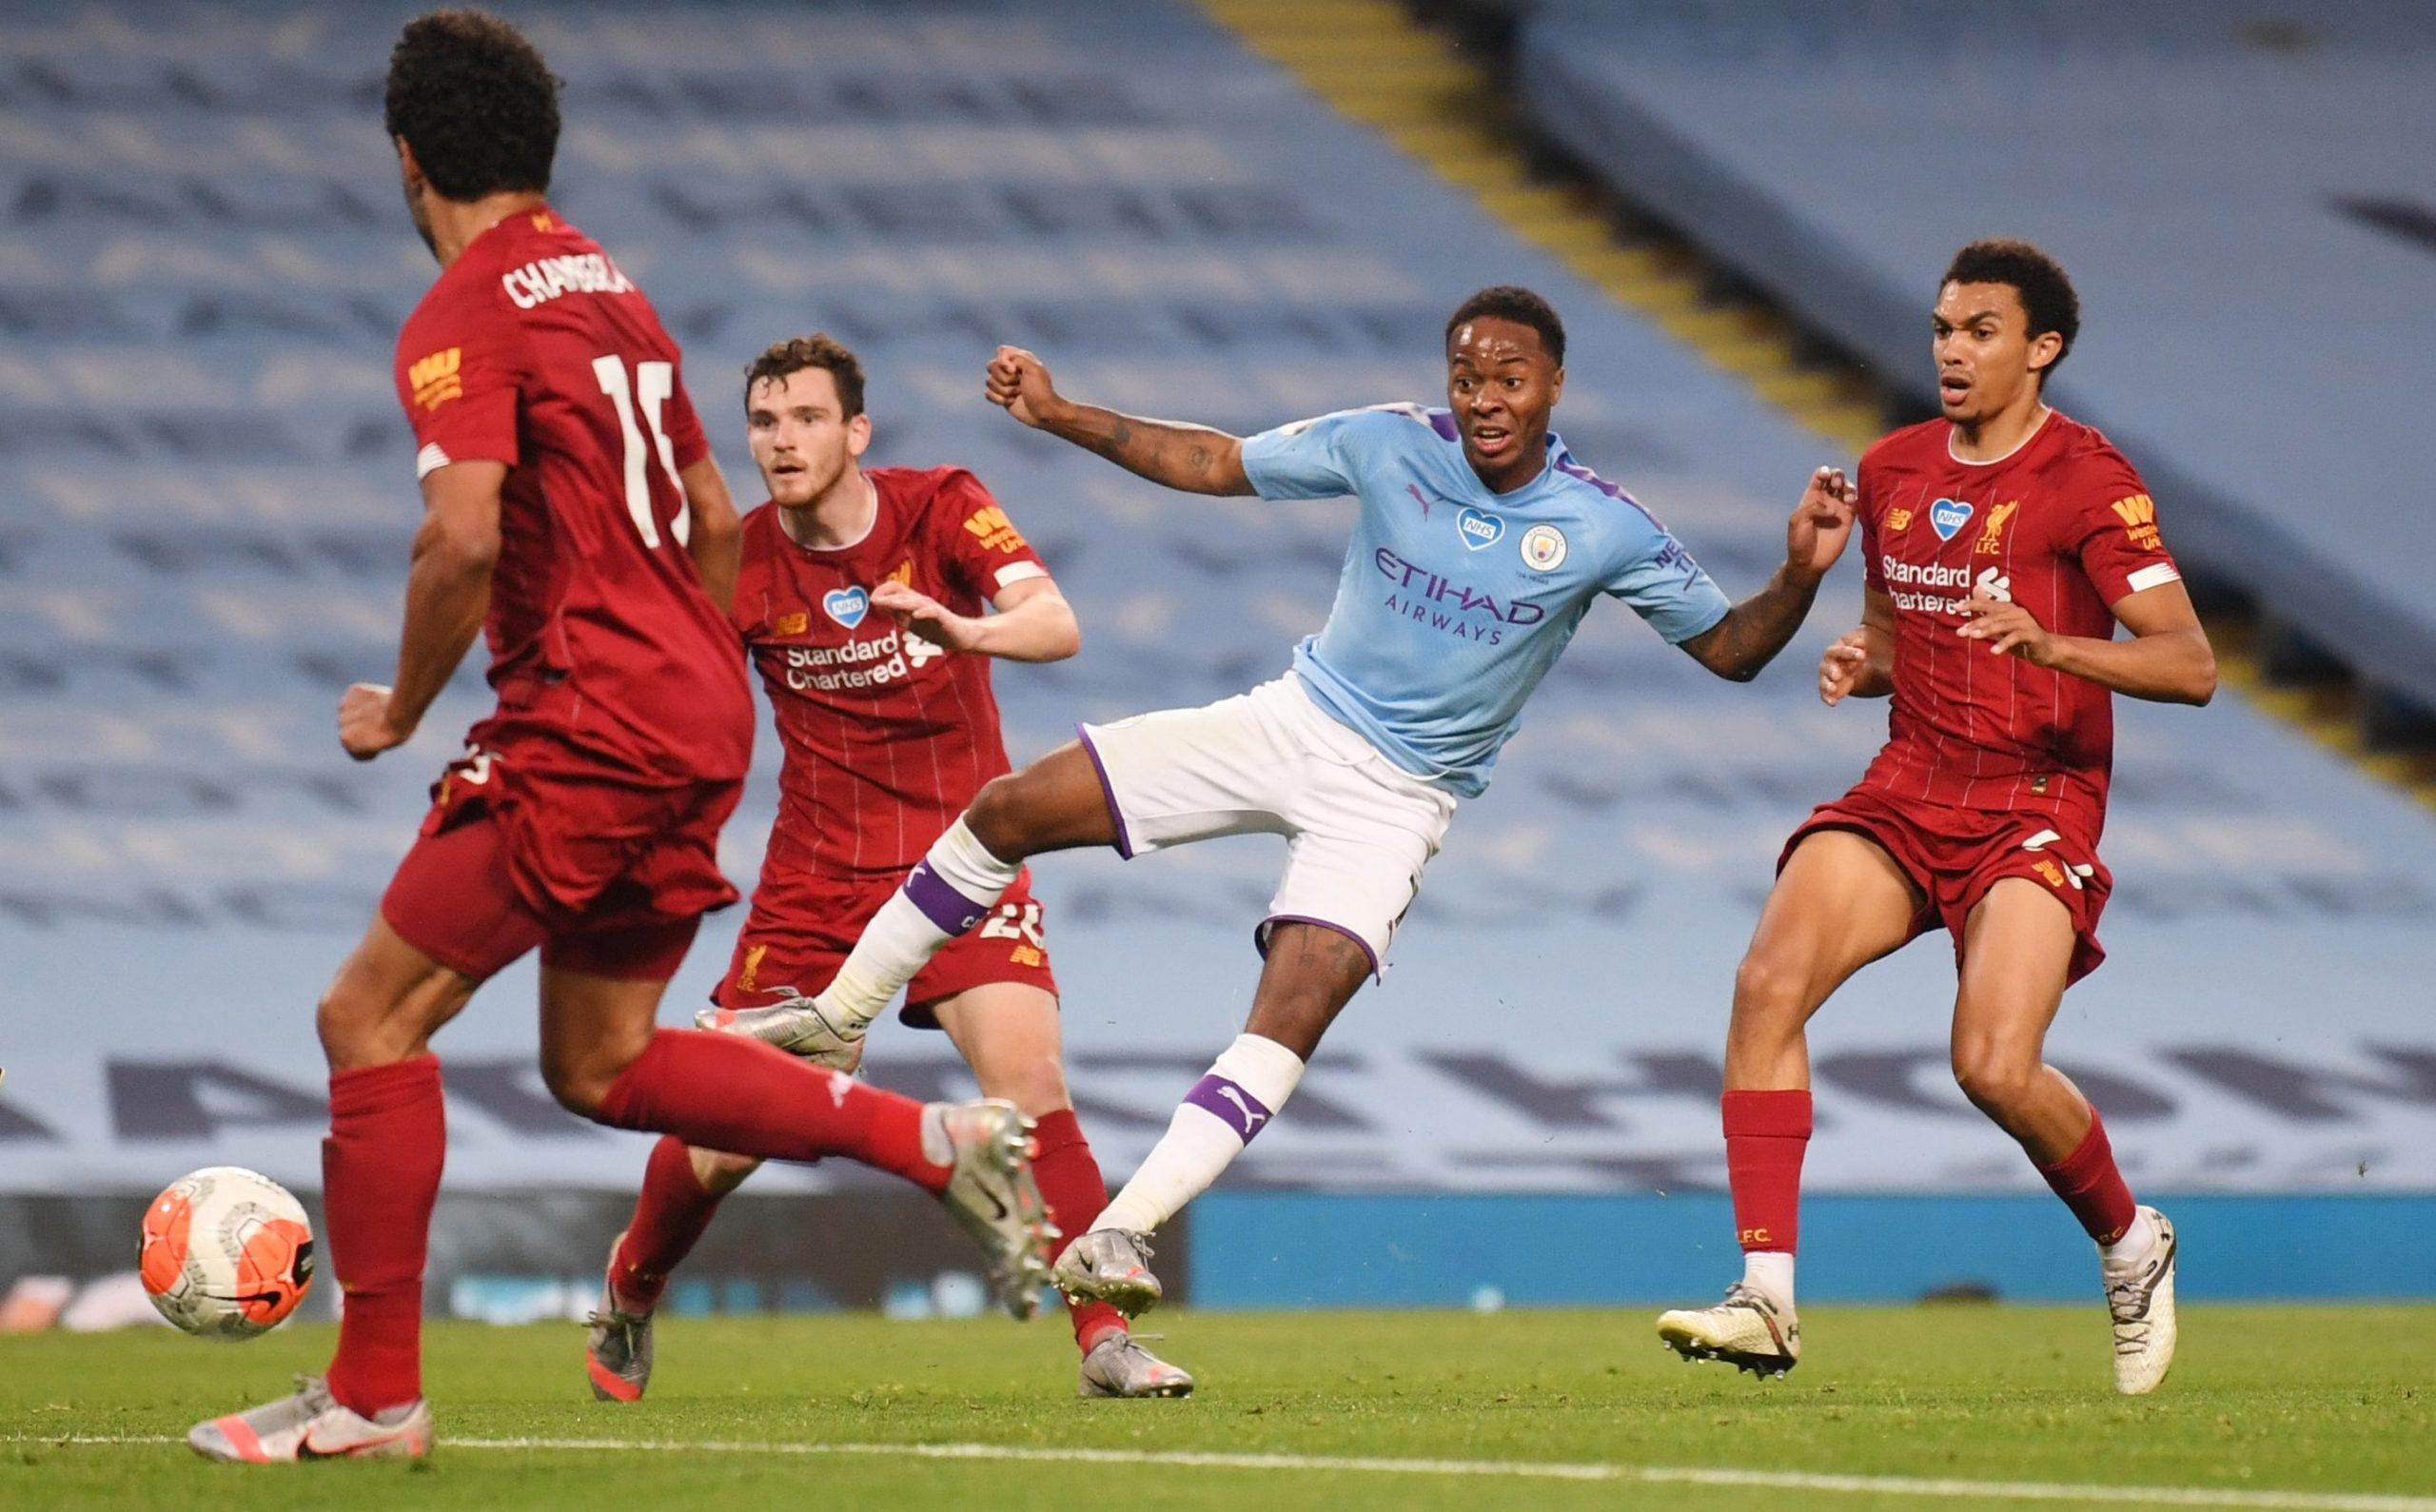 Man City Liverpool Live Stream